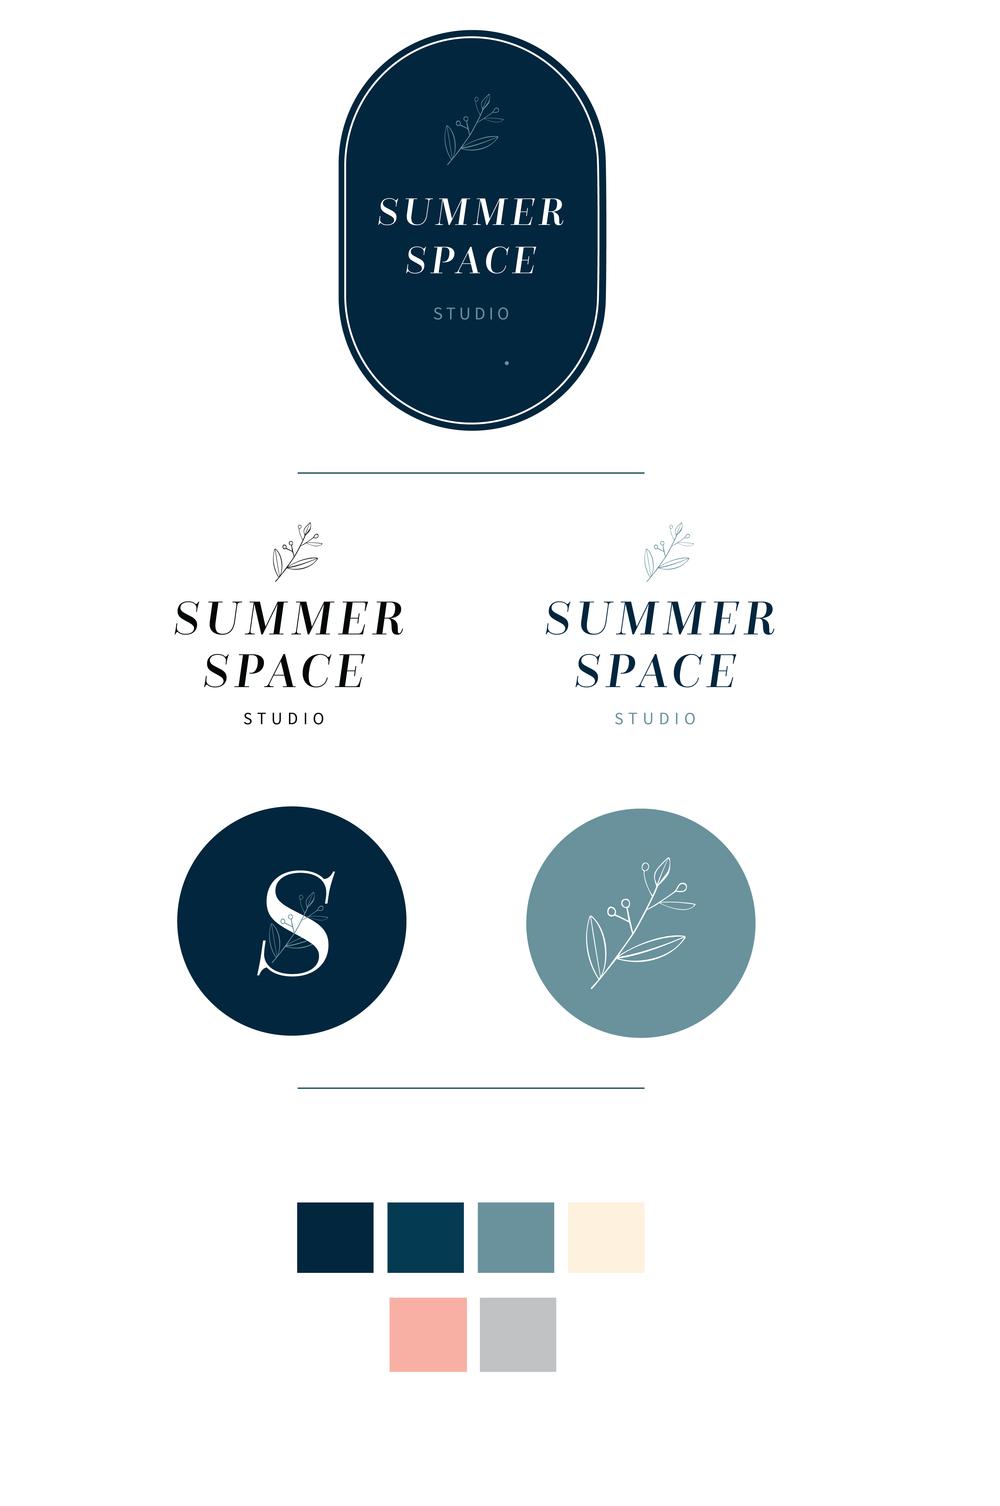 summerspace_final_june18-15.png